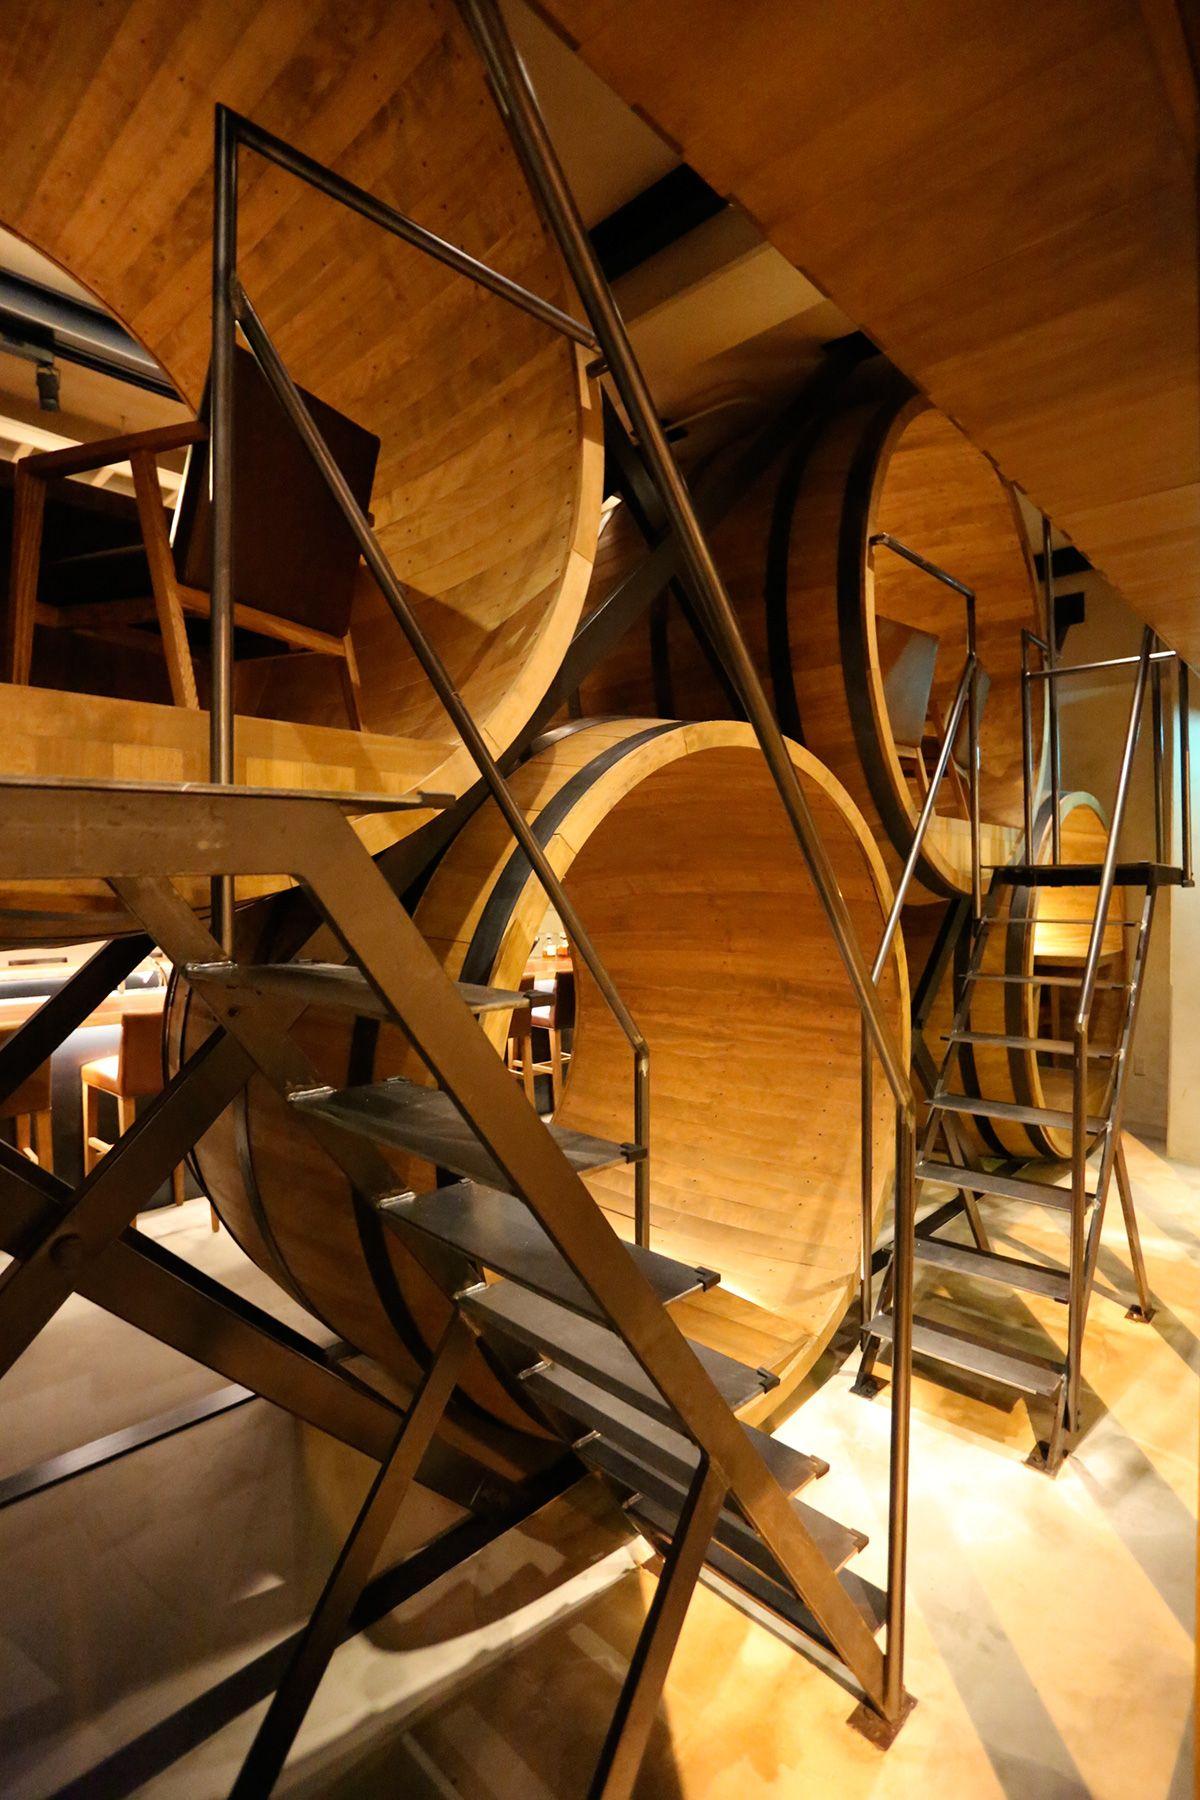 MOMENT KANDA 南口 (モーメント カンダ)/バー2階(樽の個室)へ続く階段